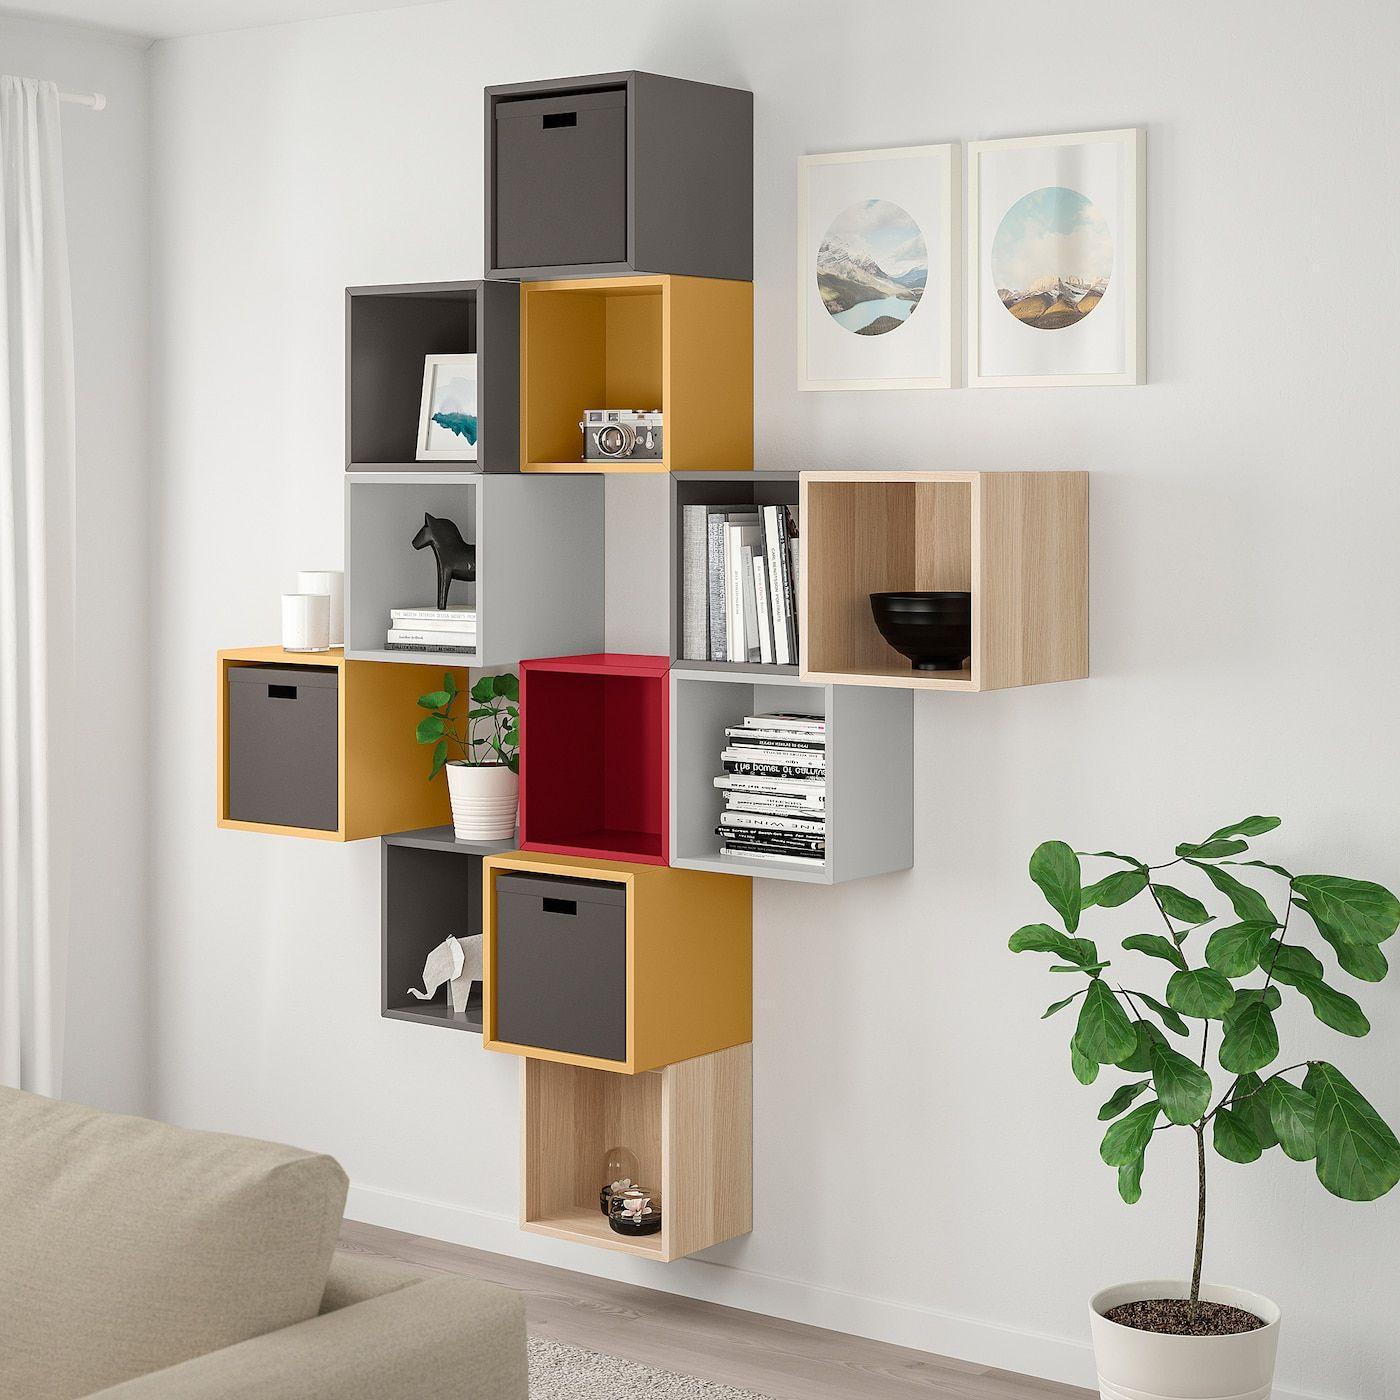 Eket Wall Mounted Cabinet Combination Multicolor 1 Ikea Eket Wall Mounted Cabinet Ikea Eket